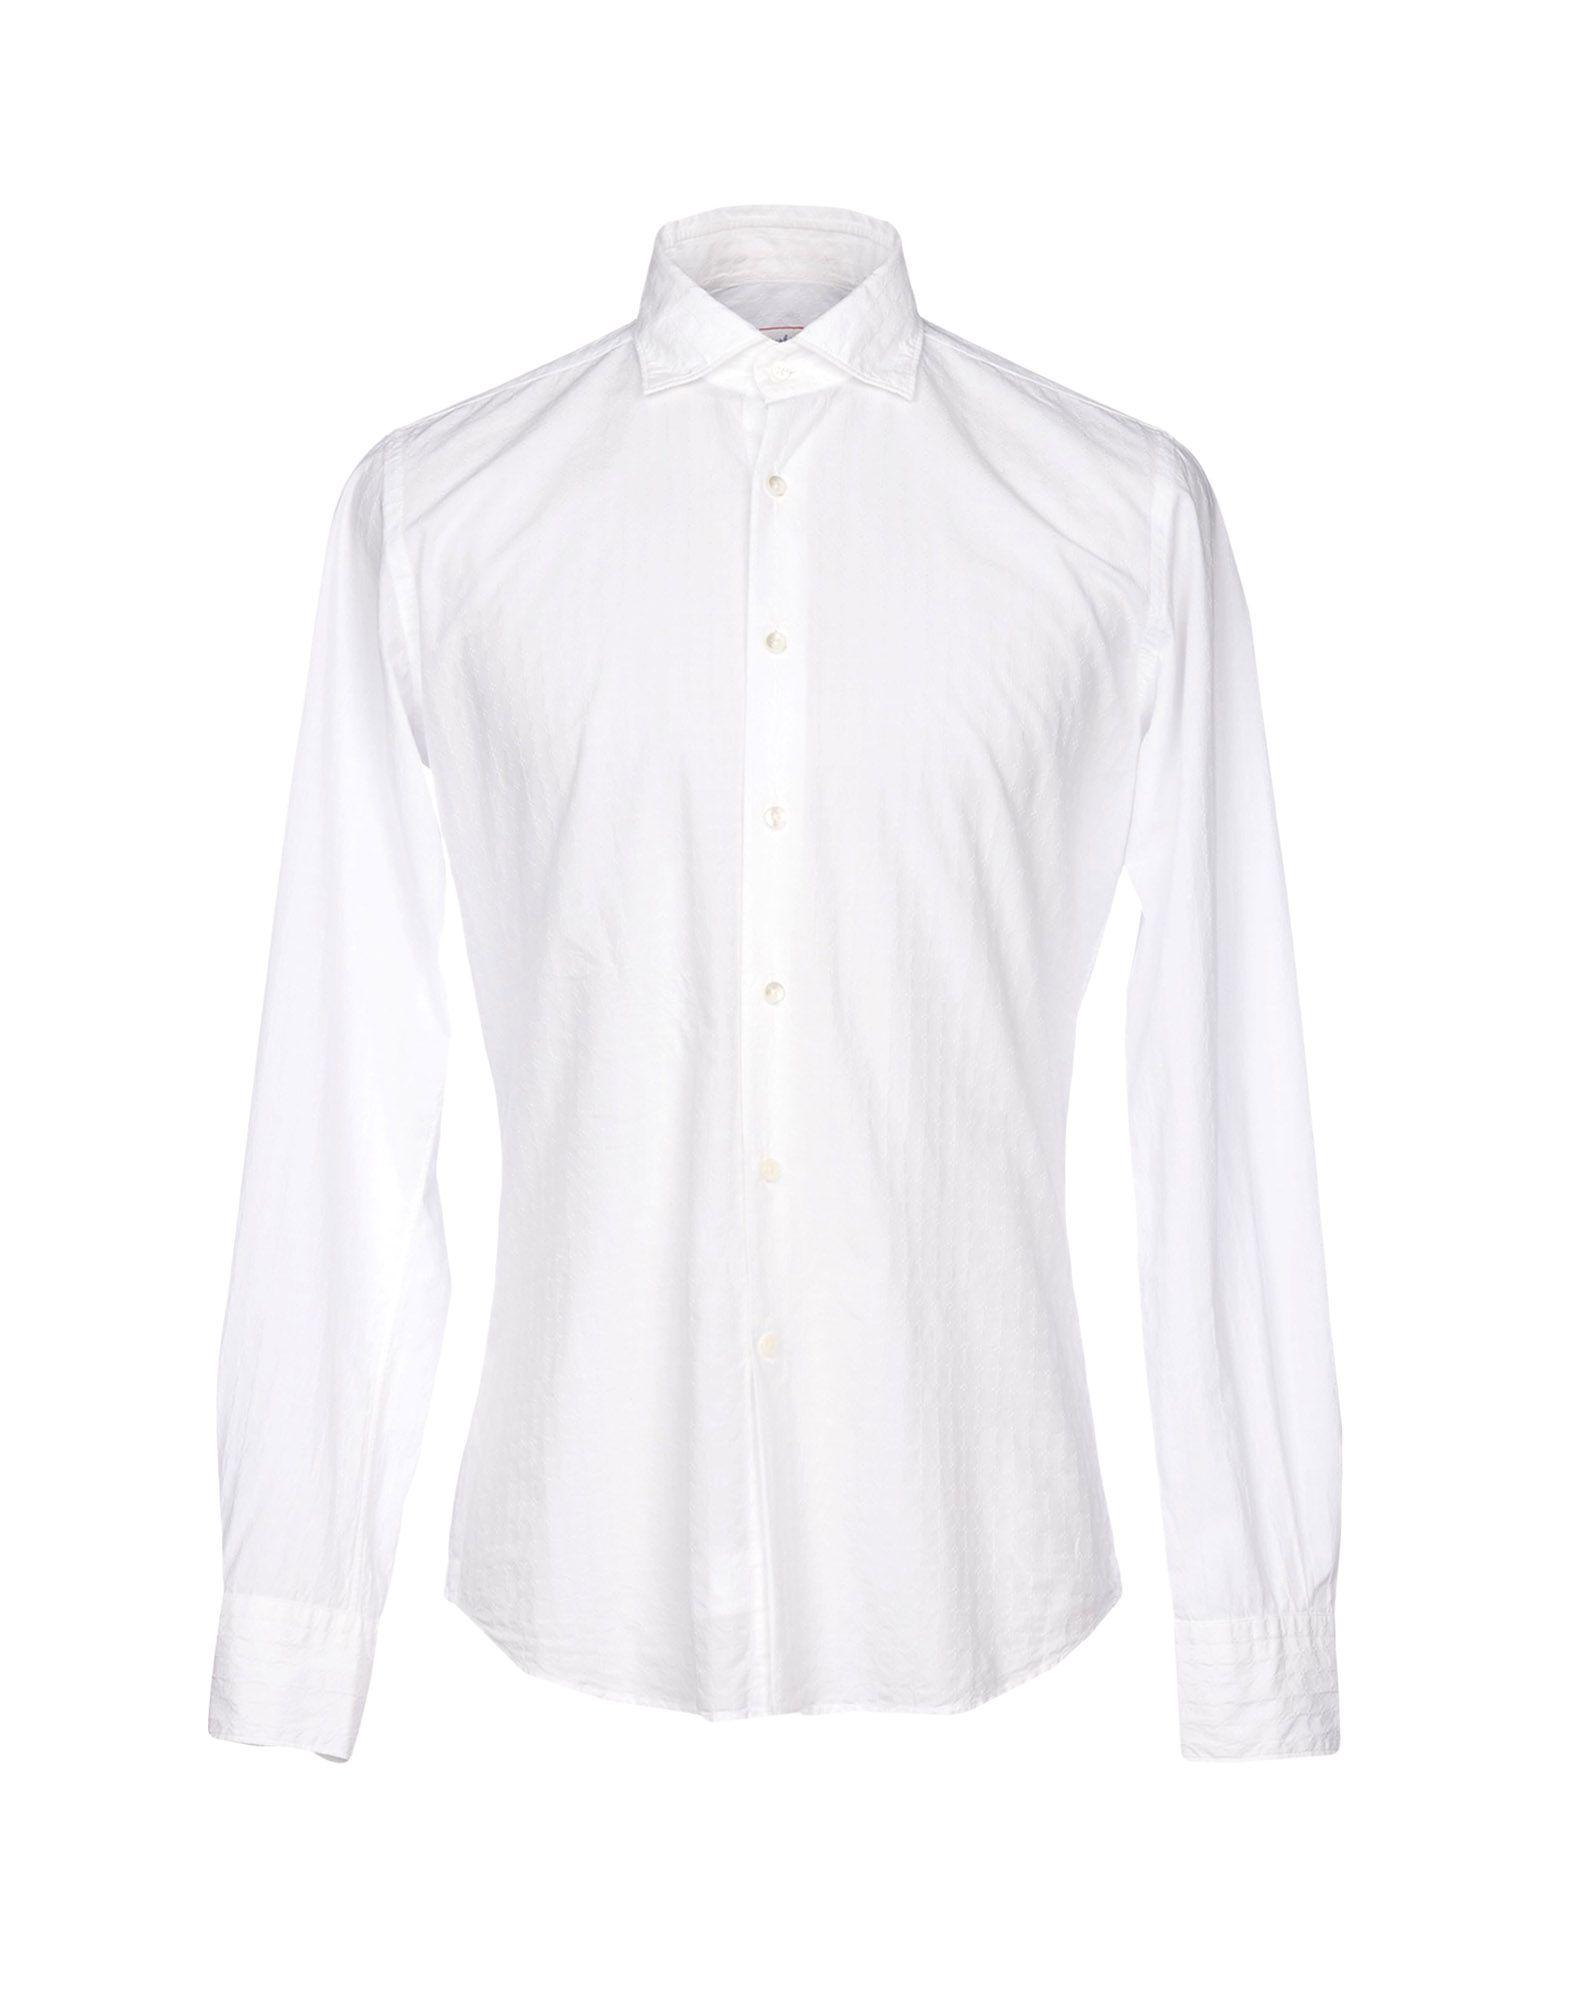 GLANSHIRT Pубашка